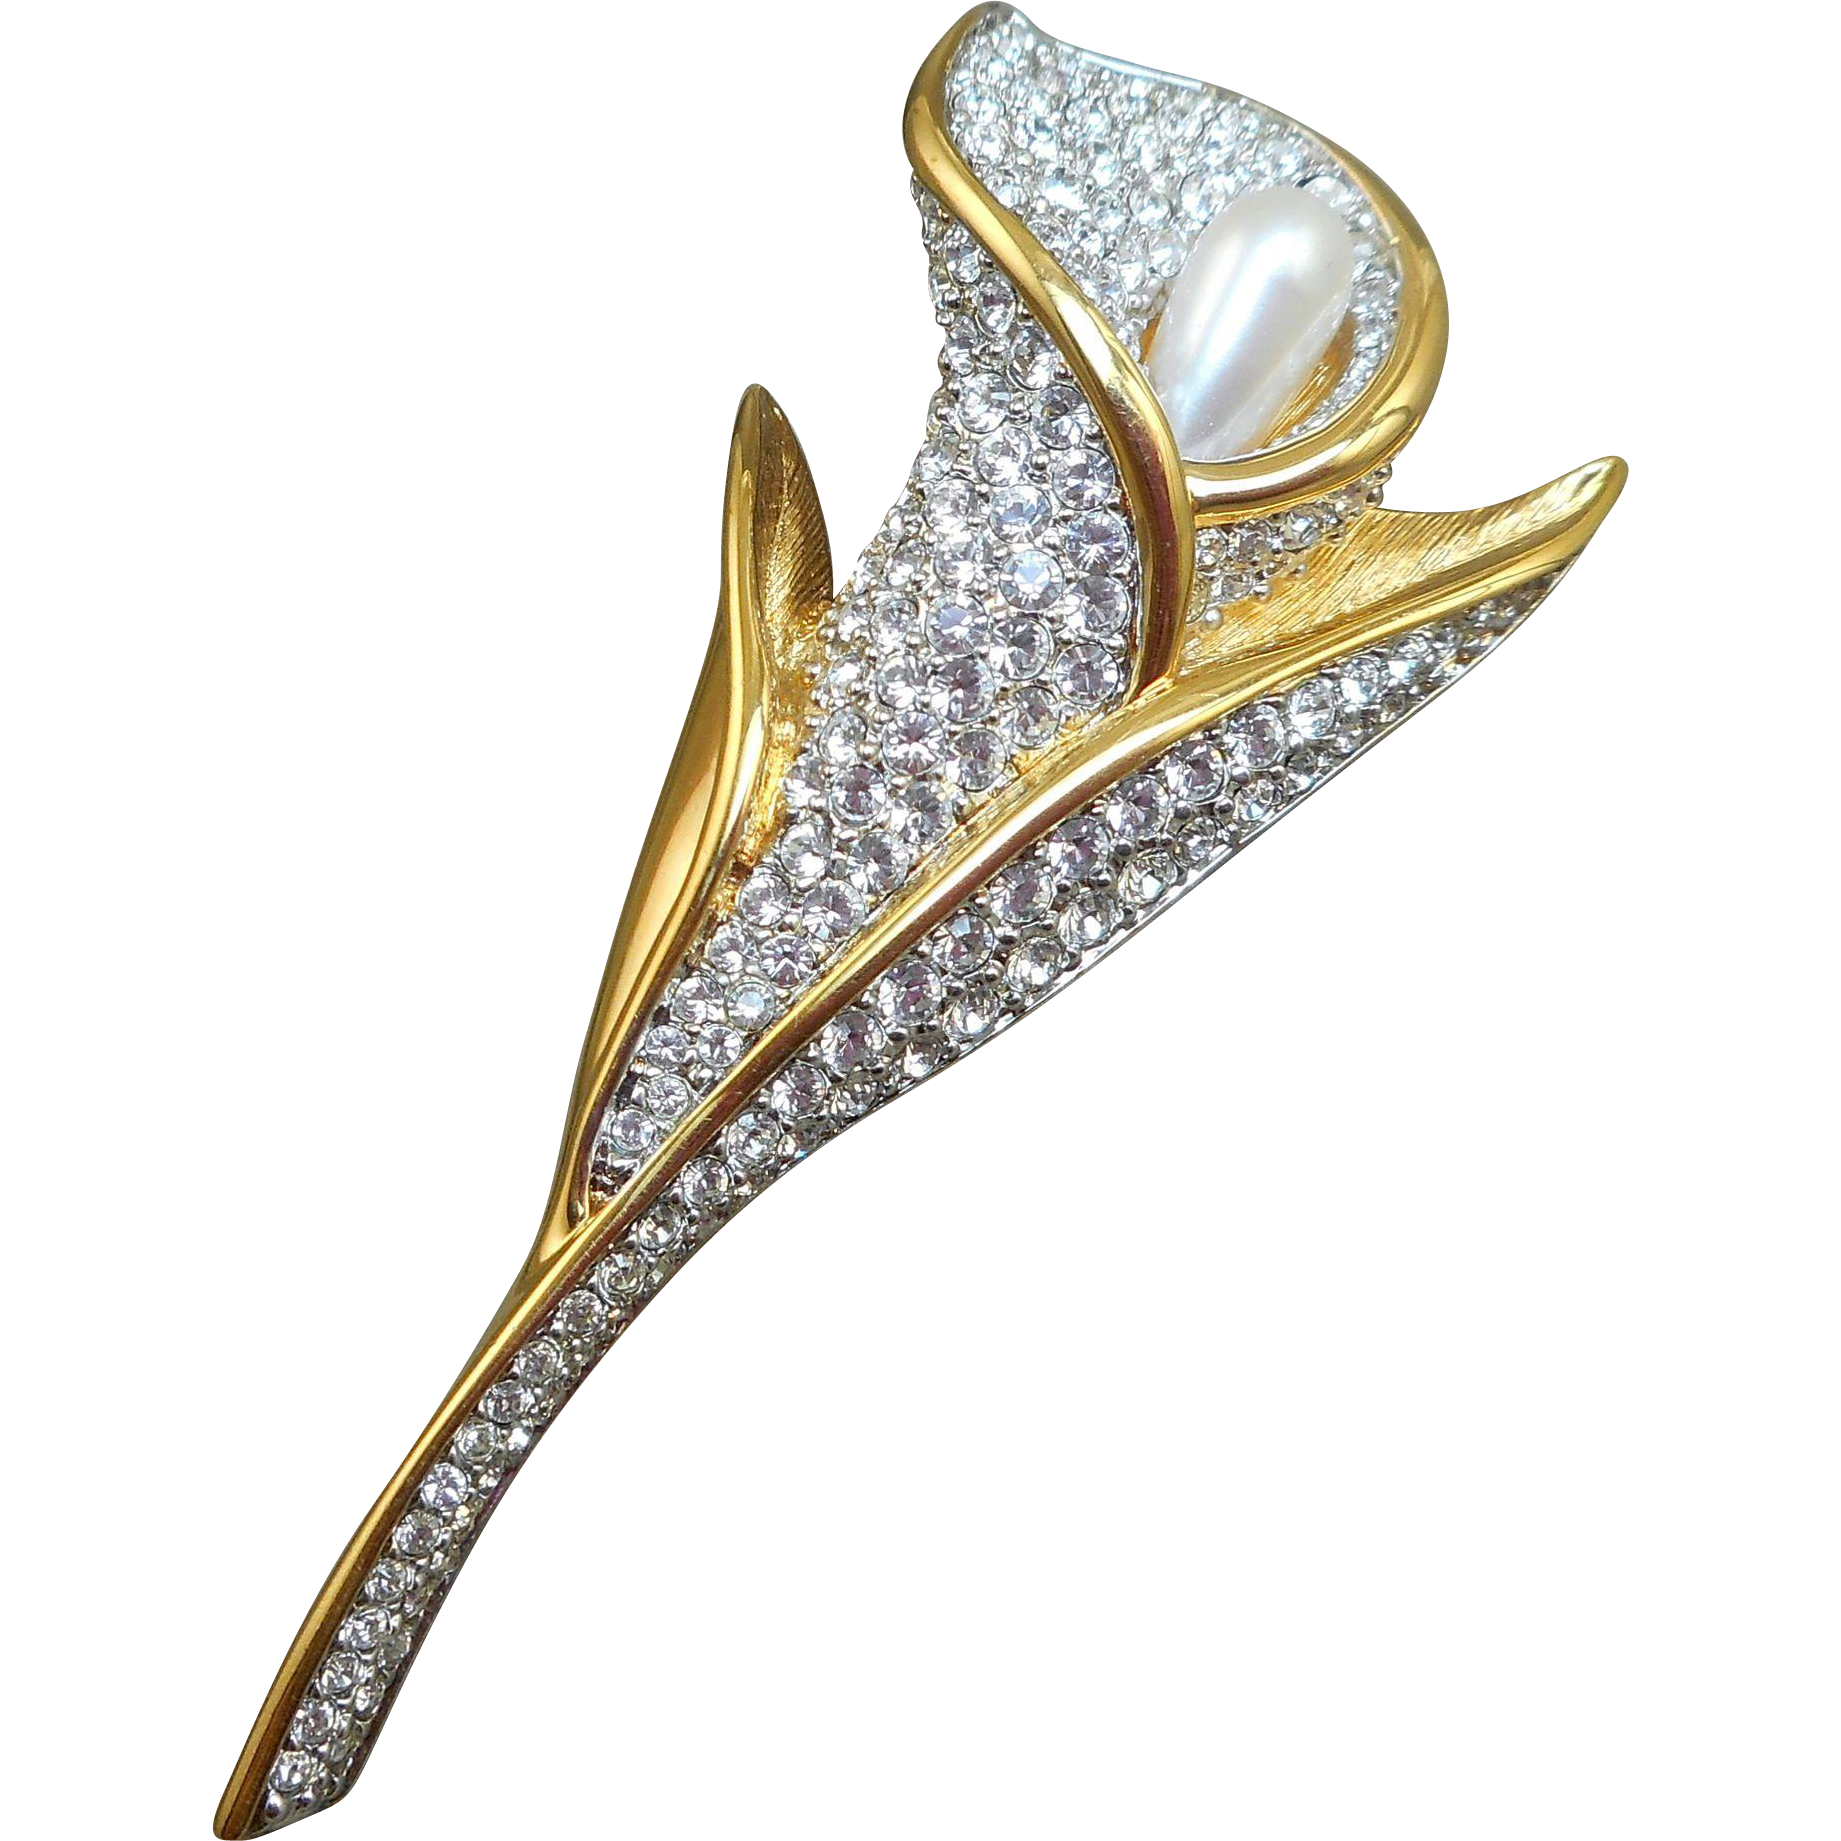 Swarovski Calla Lily Flower Brooch